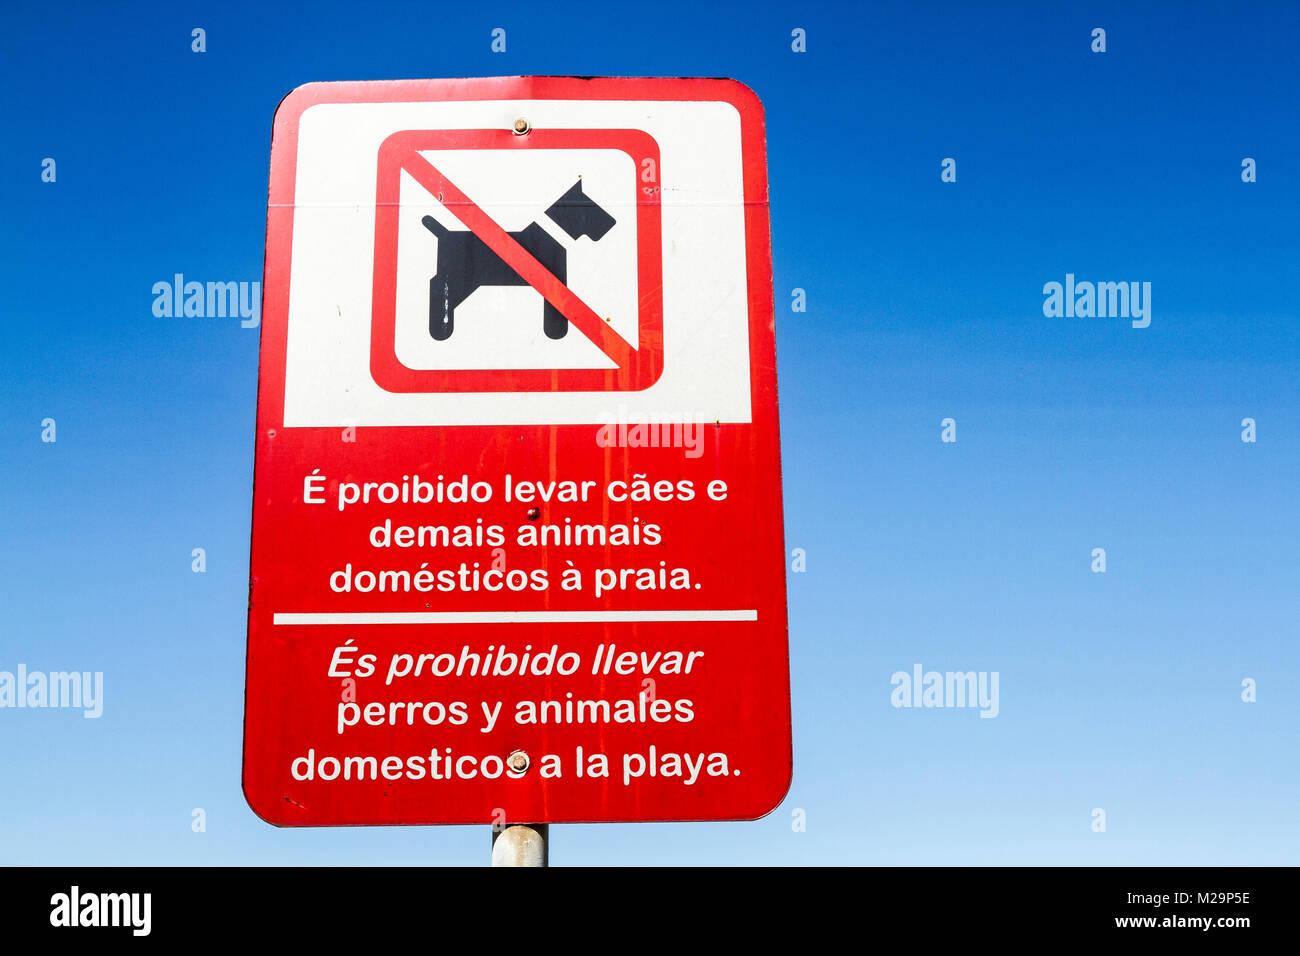 Bilingual urban signage at Meia Praia Beach. Itapema, Santa Catarina, Brazil. - Stock Image